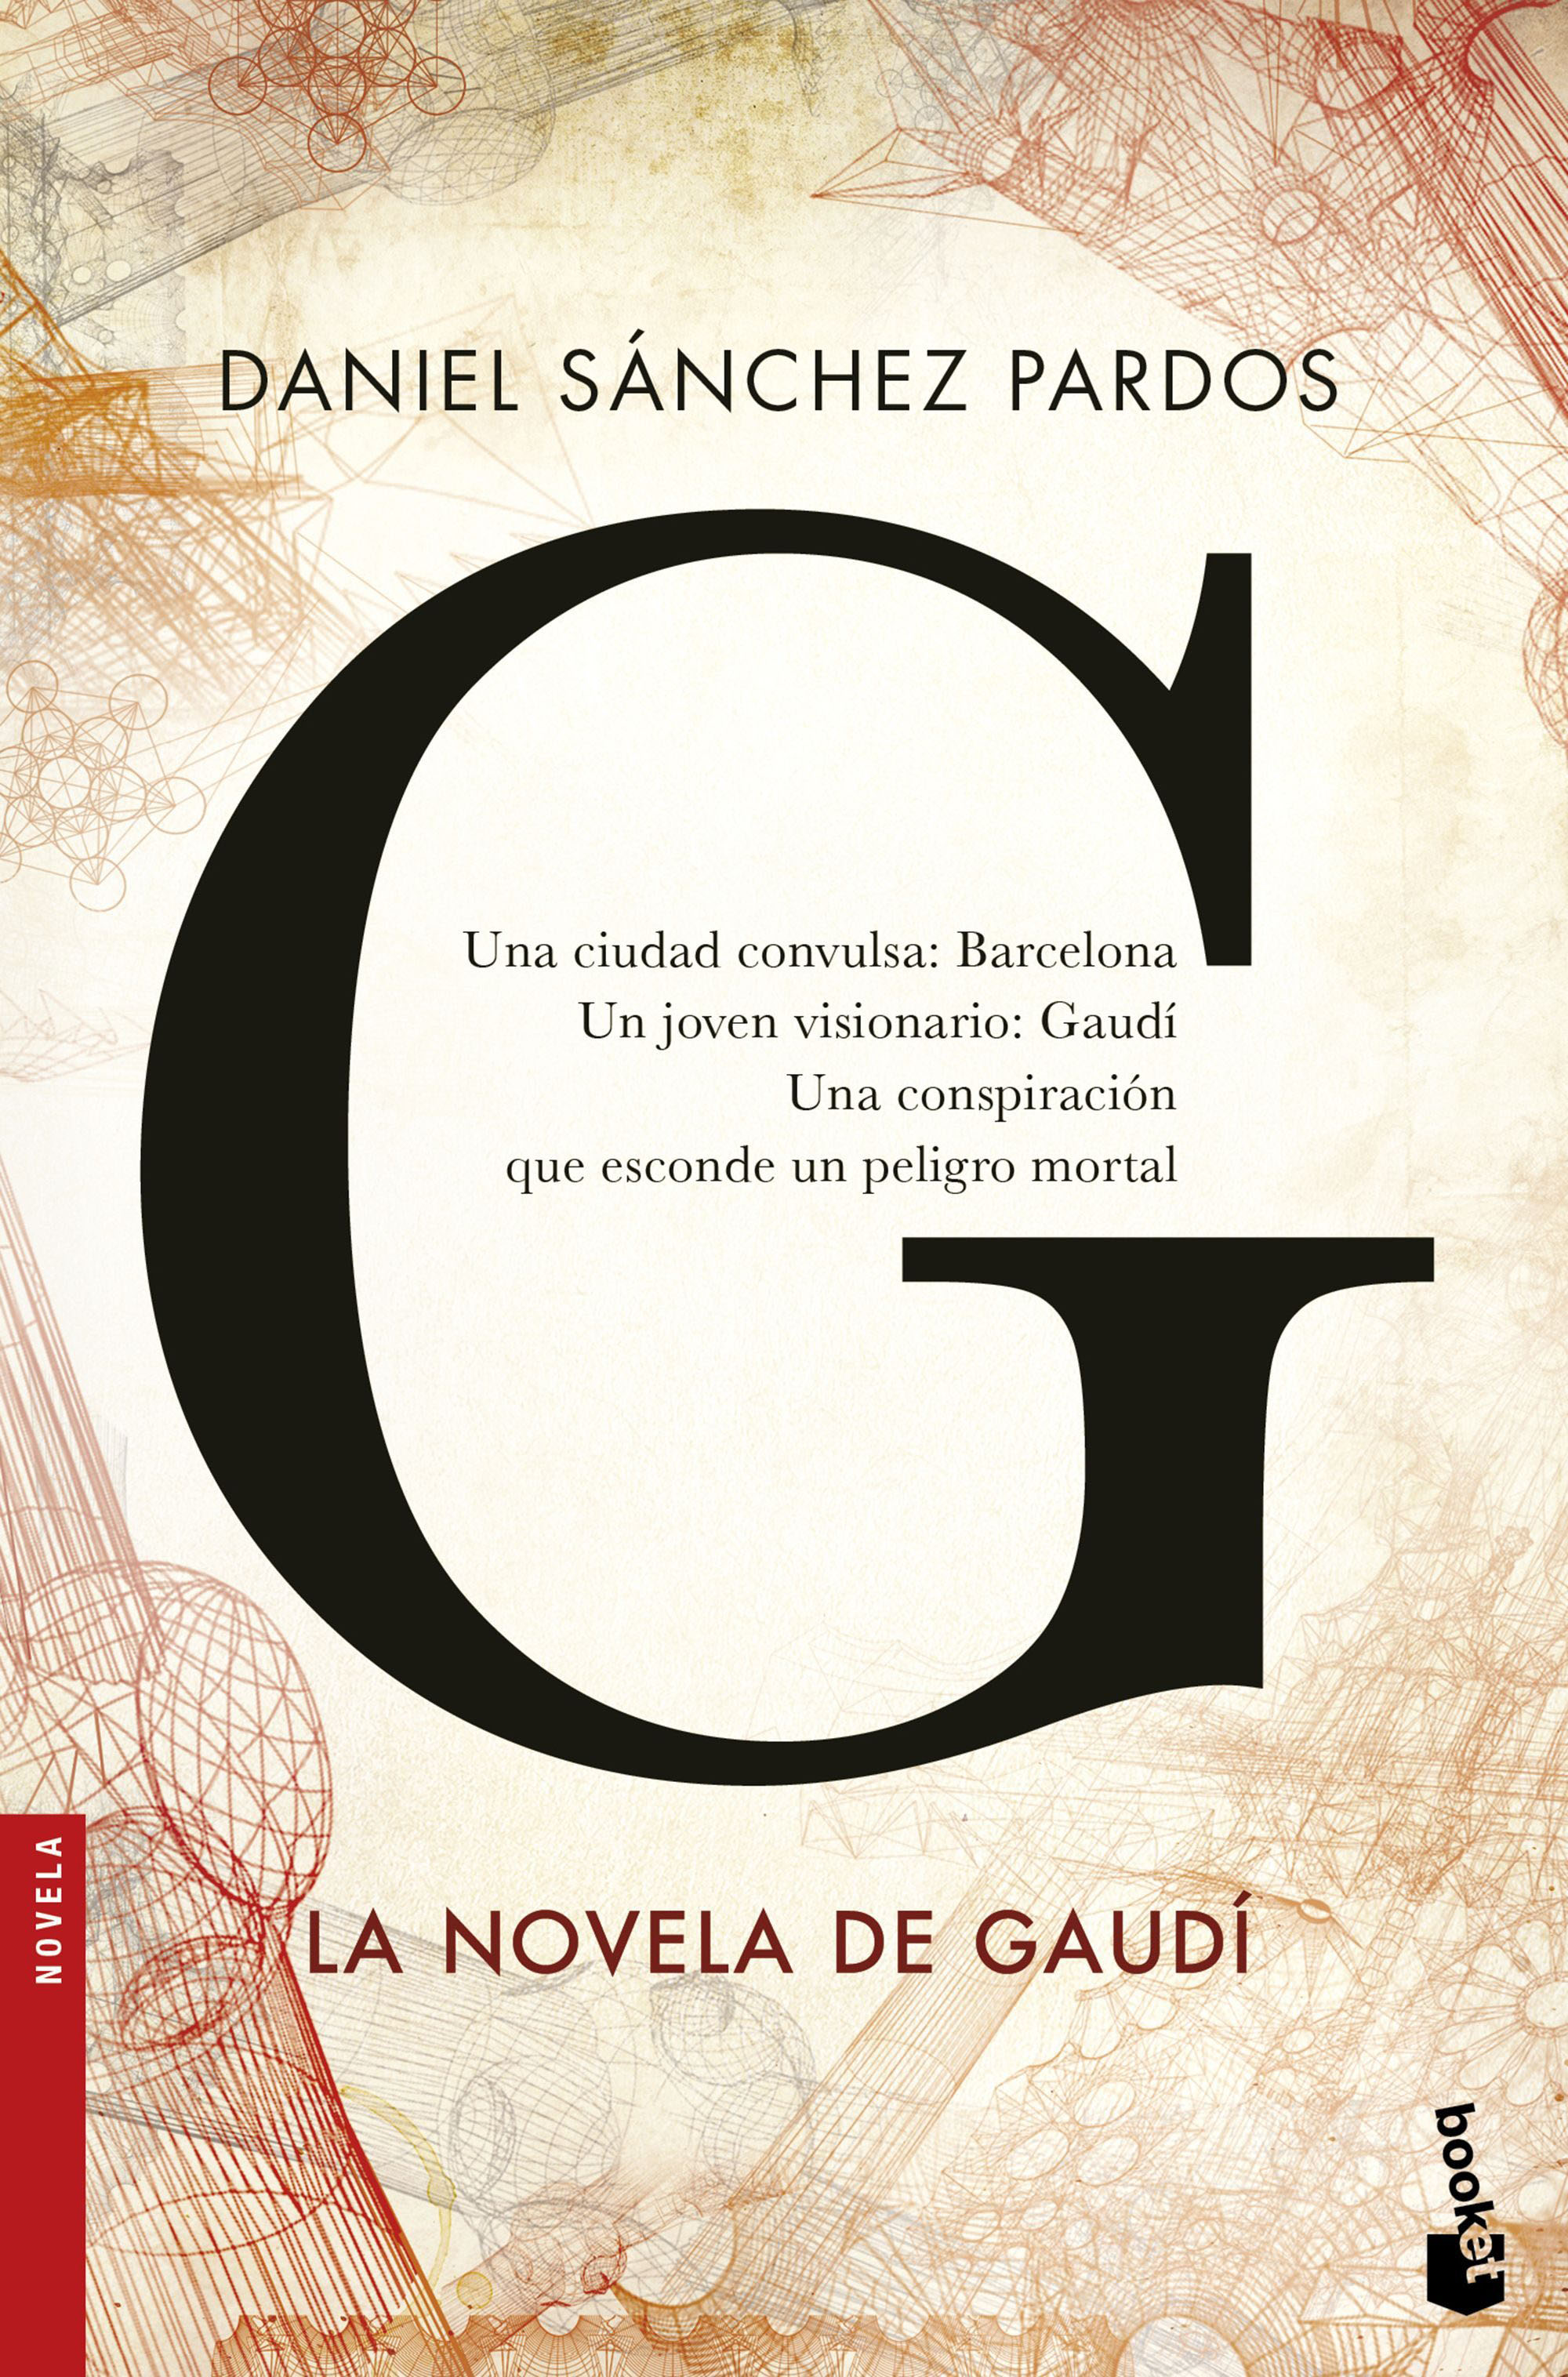 G. La Novela De Gaudi amapolas en octubre